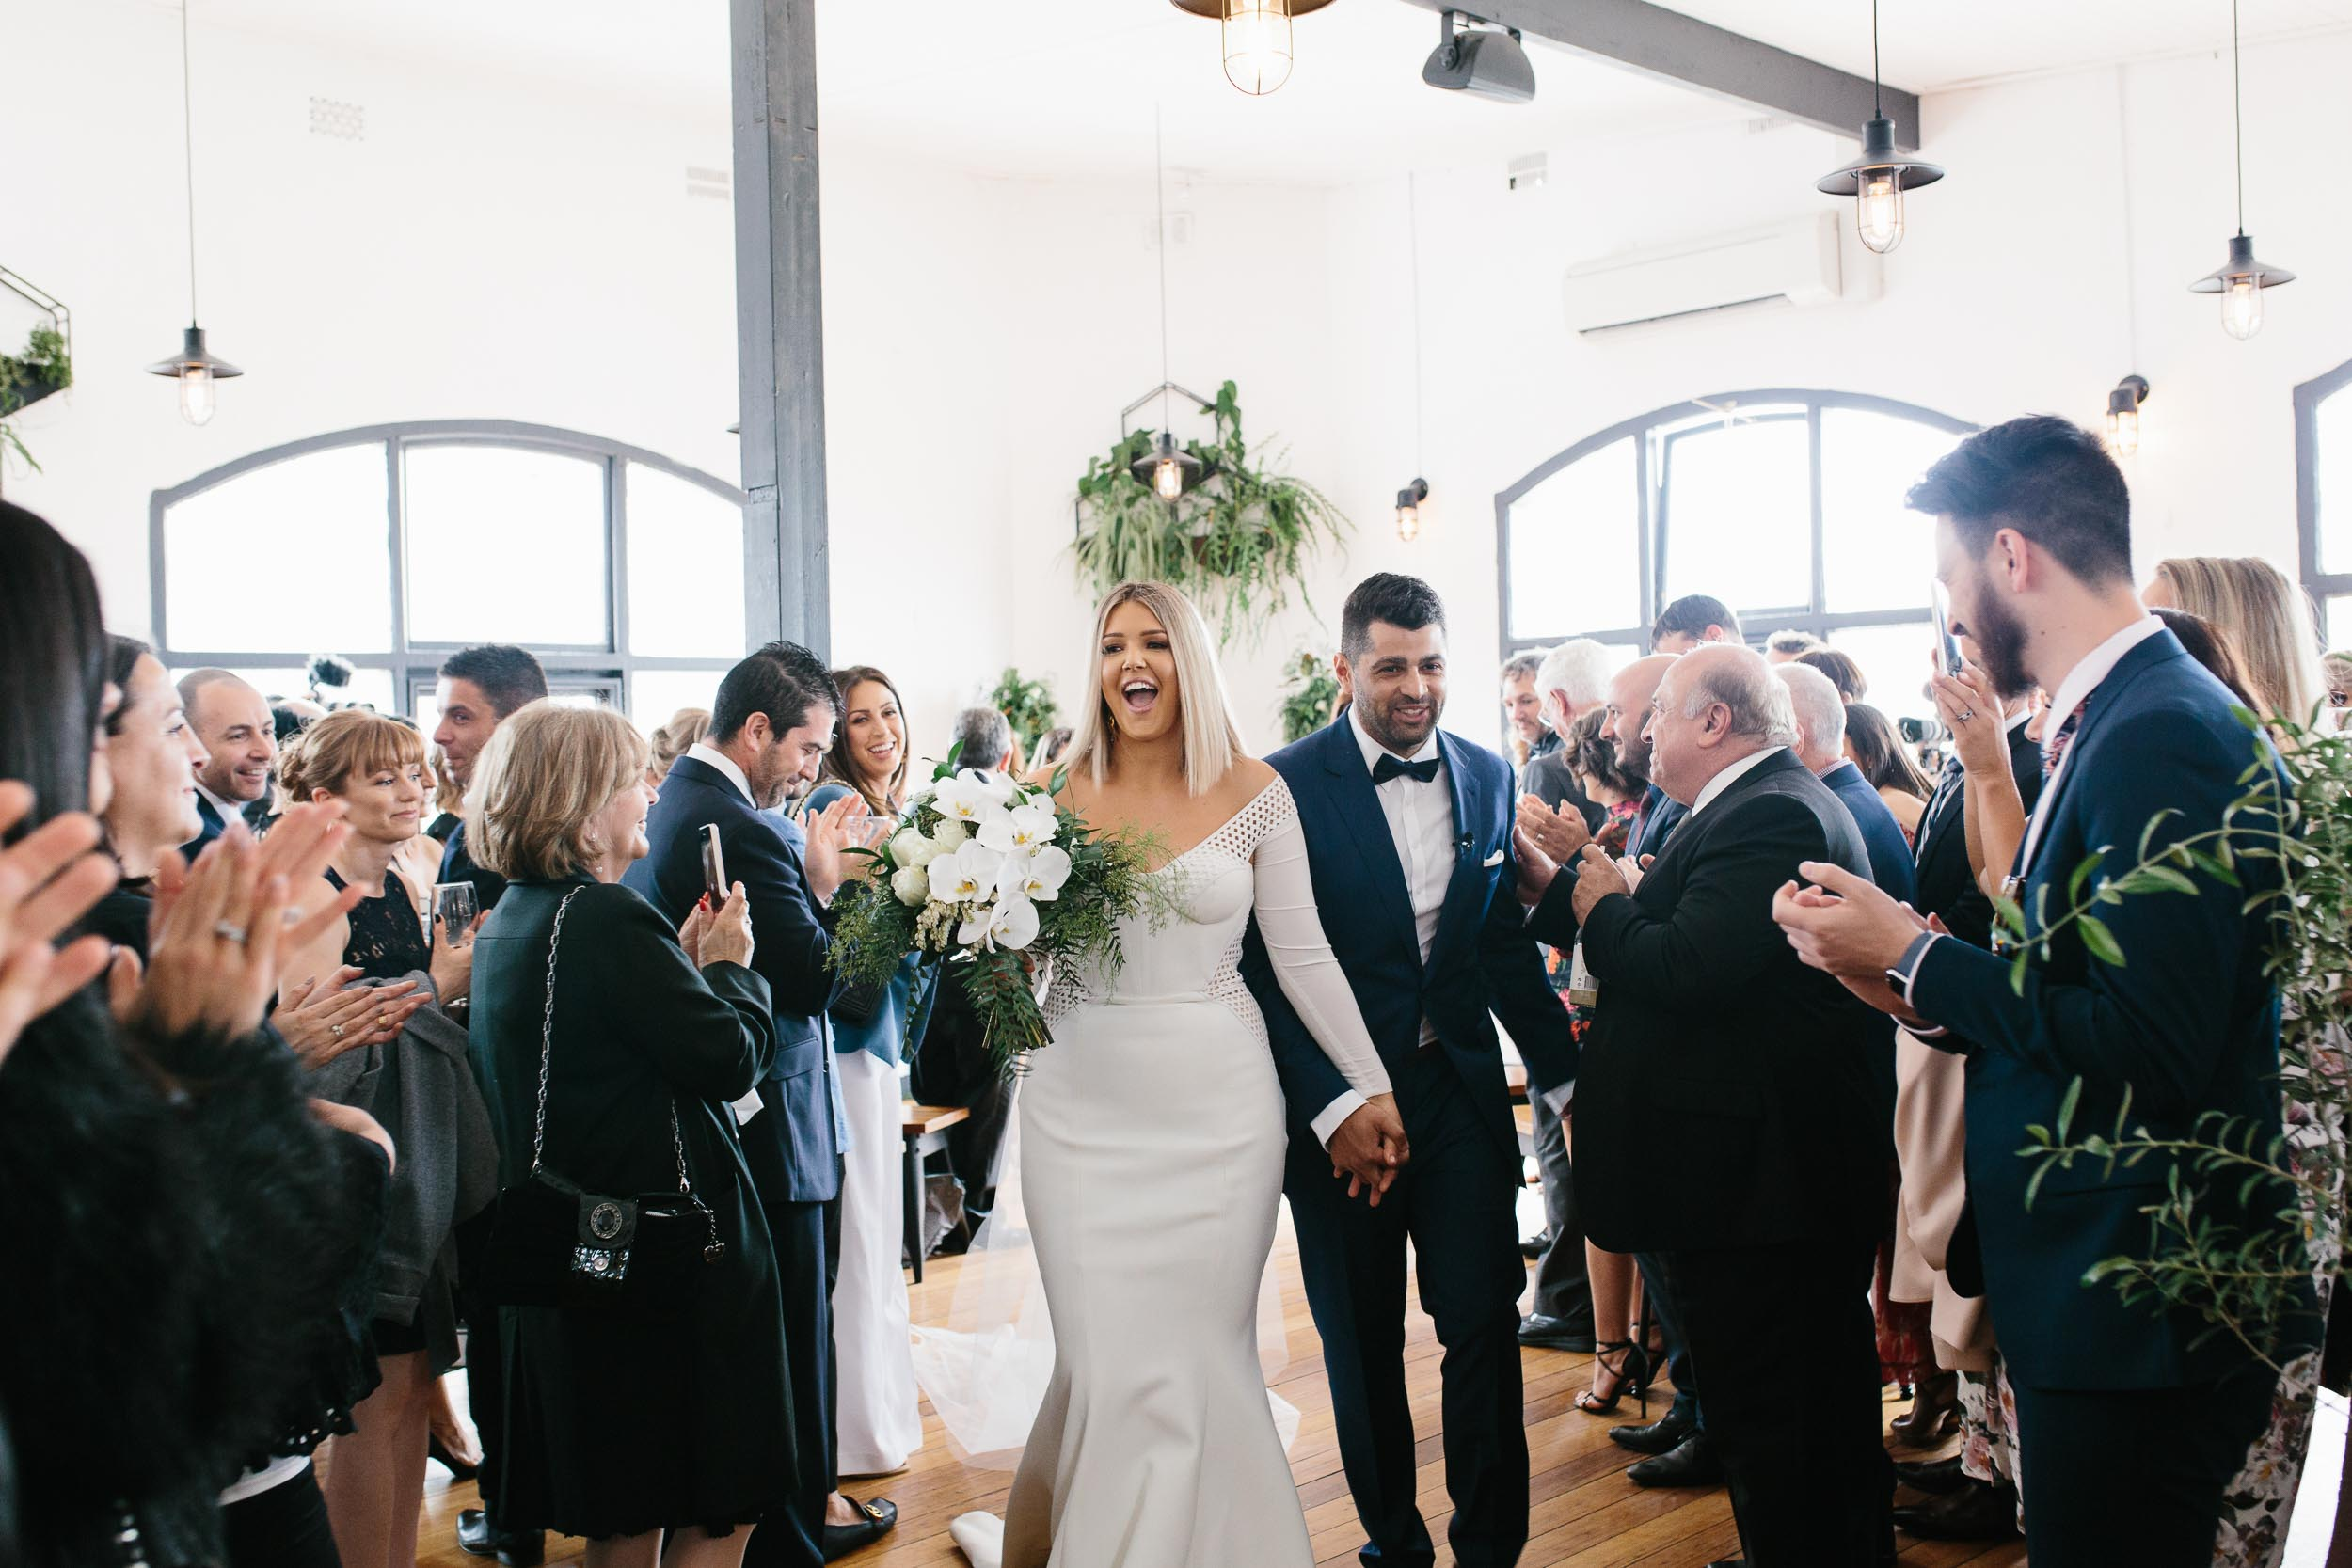 Kas-Richards-Urban-Melbourne-Wedding-Jason-Grech-350.jpg